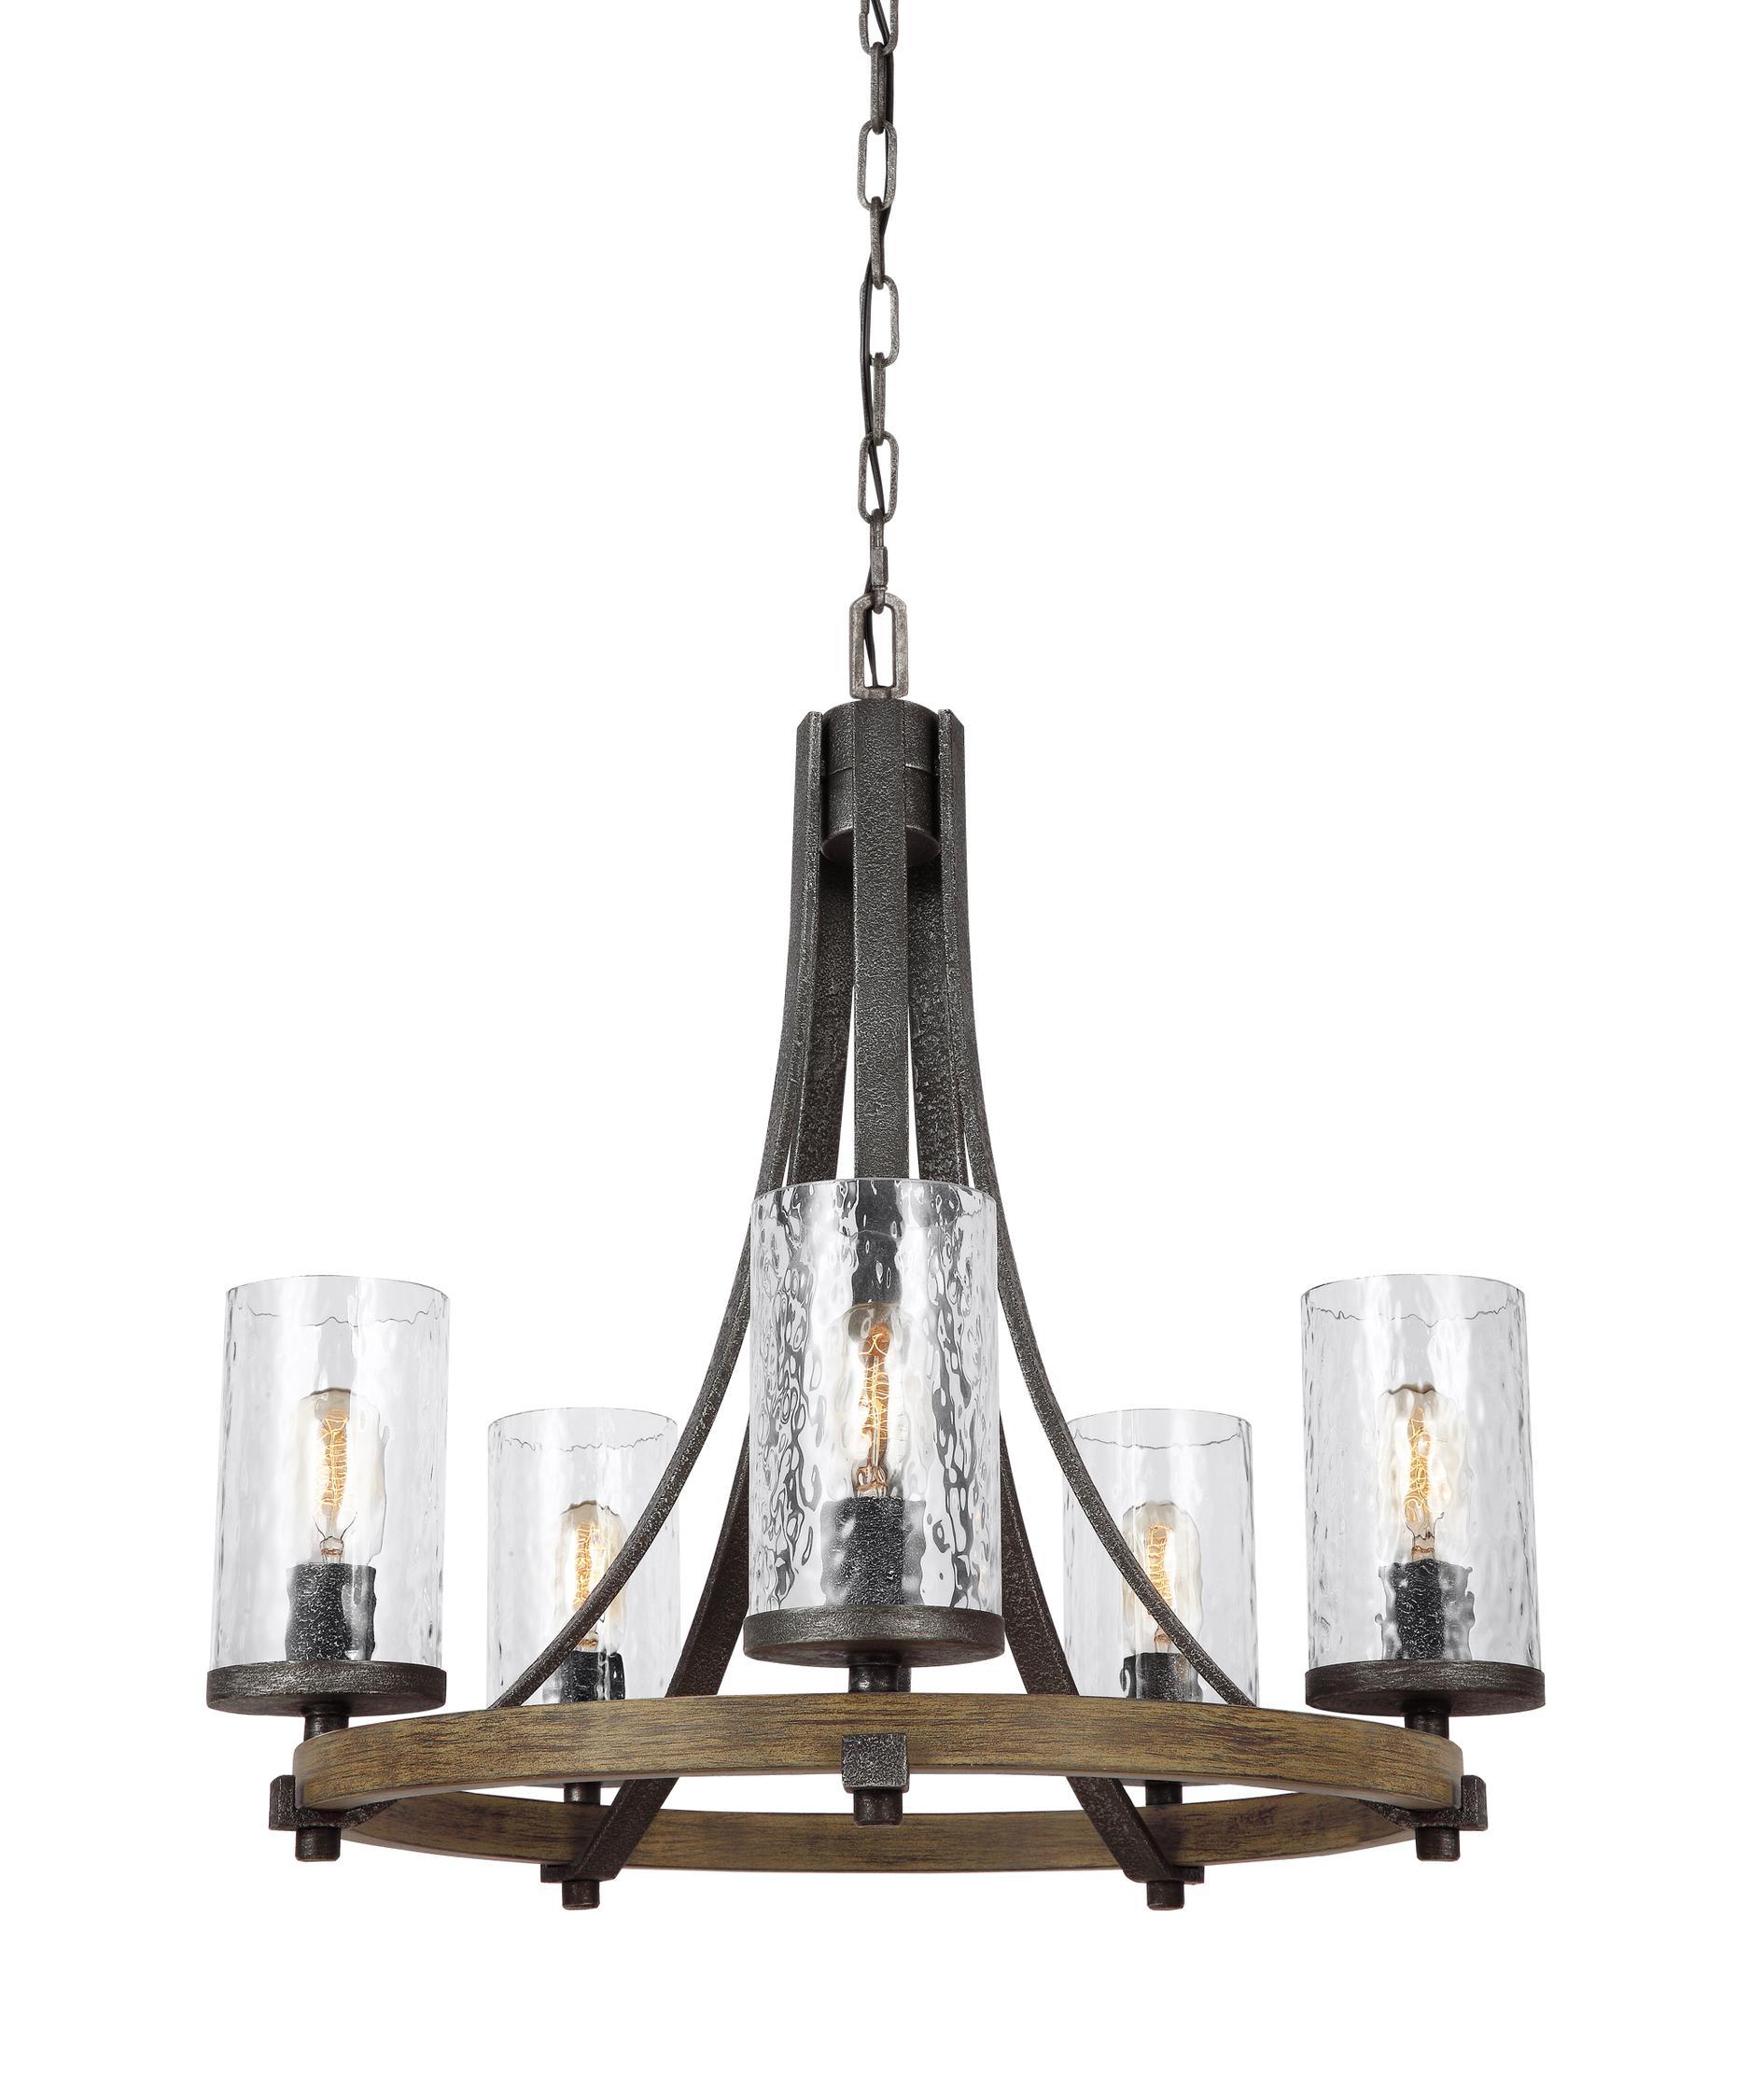 murray feiss f31335 angelo 24 inch wide 5 light chandelier capitol lighting - Feiss Lighting